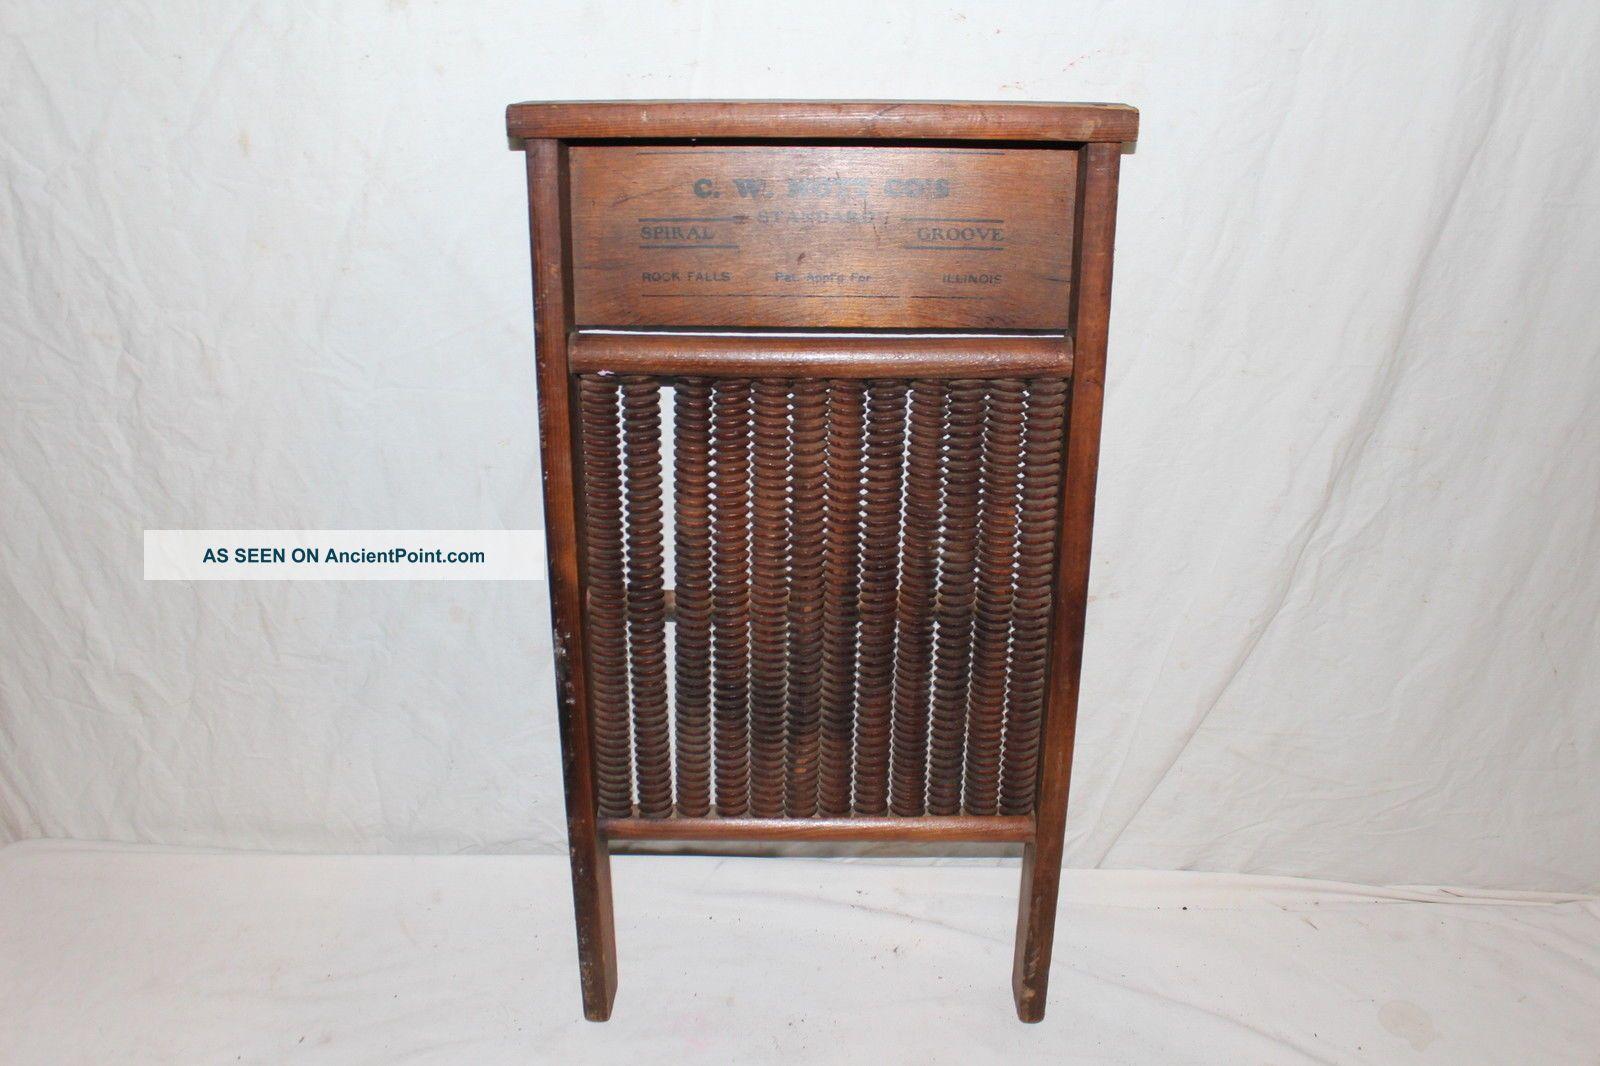 Rare Antique C.  1900 C.  W.  Mott Spiral Groove Wood Washboard Primative Kitchen Tool Washing Machines photo